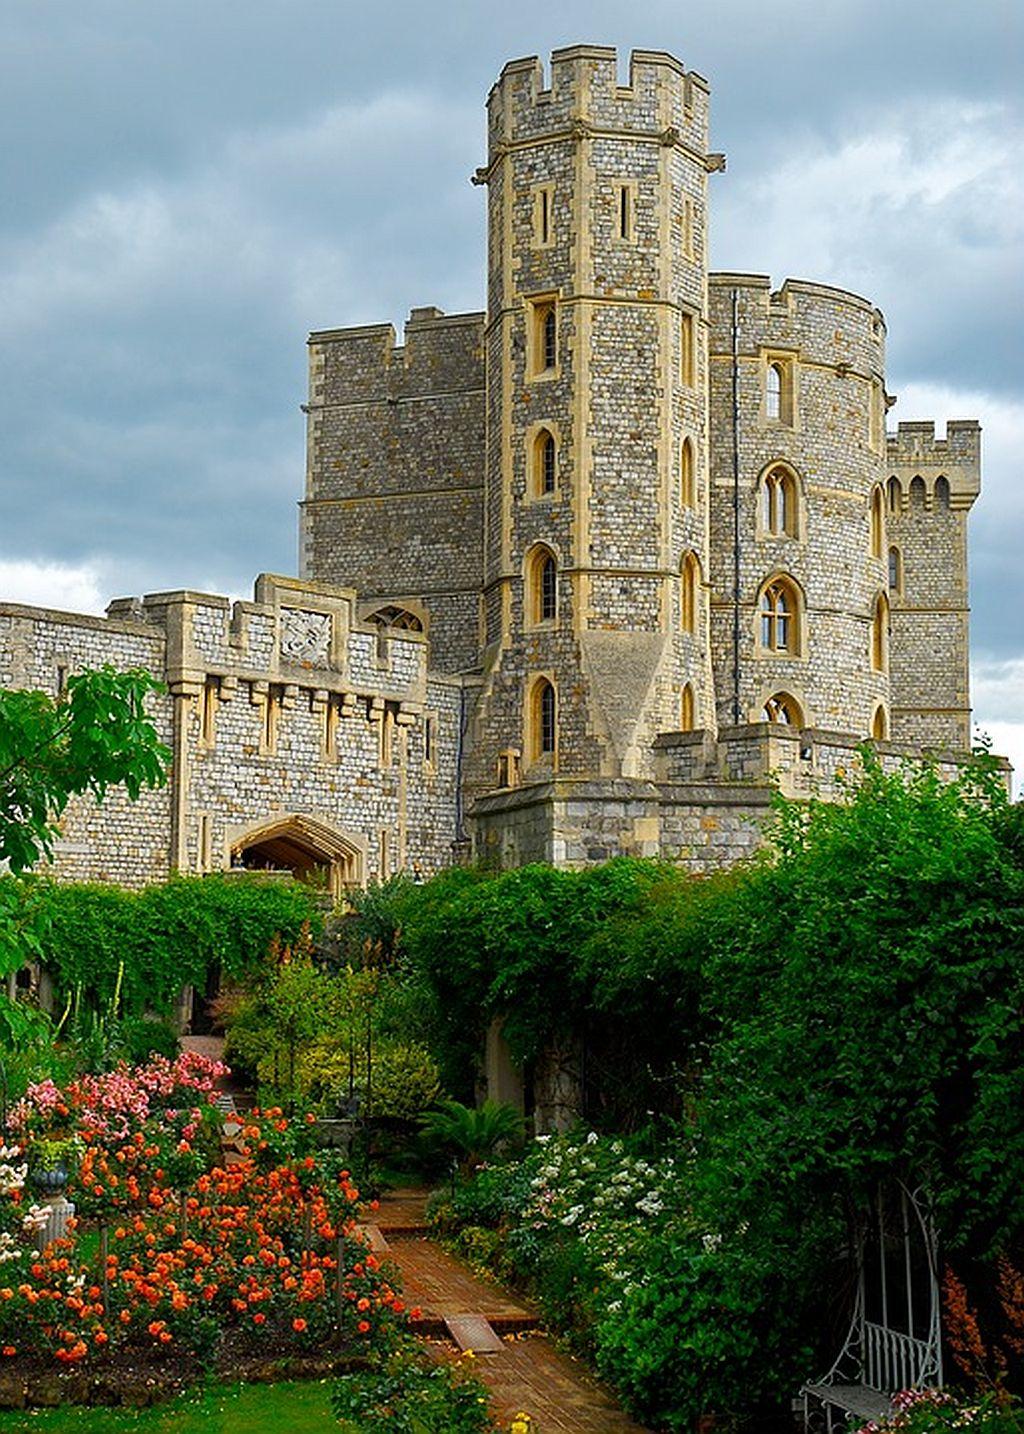 The gardens of Windsor Castle